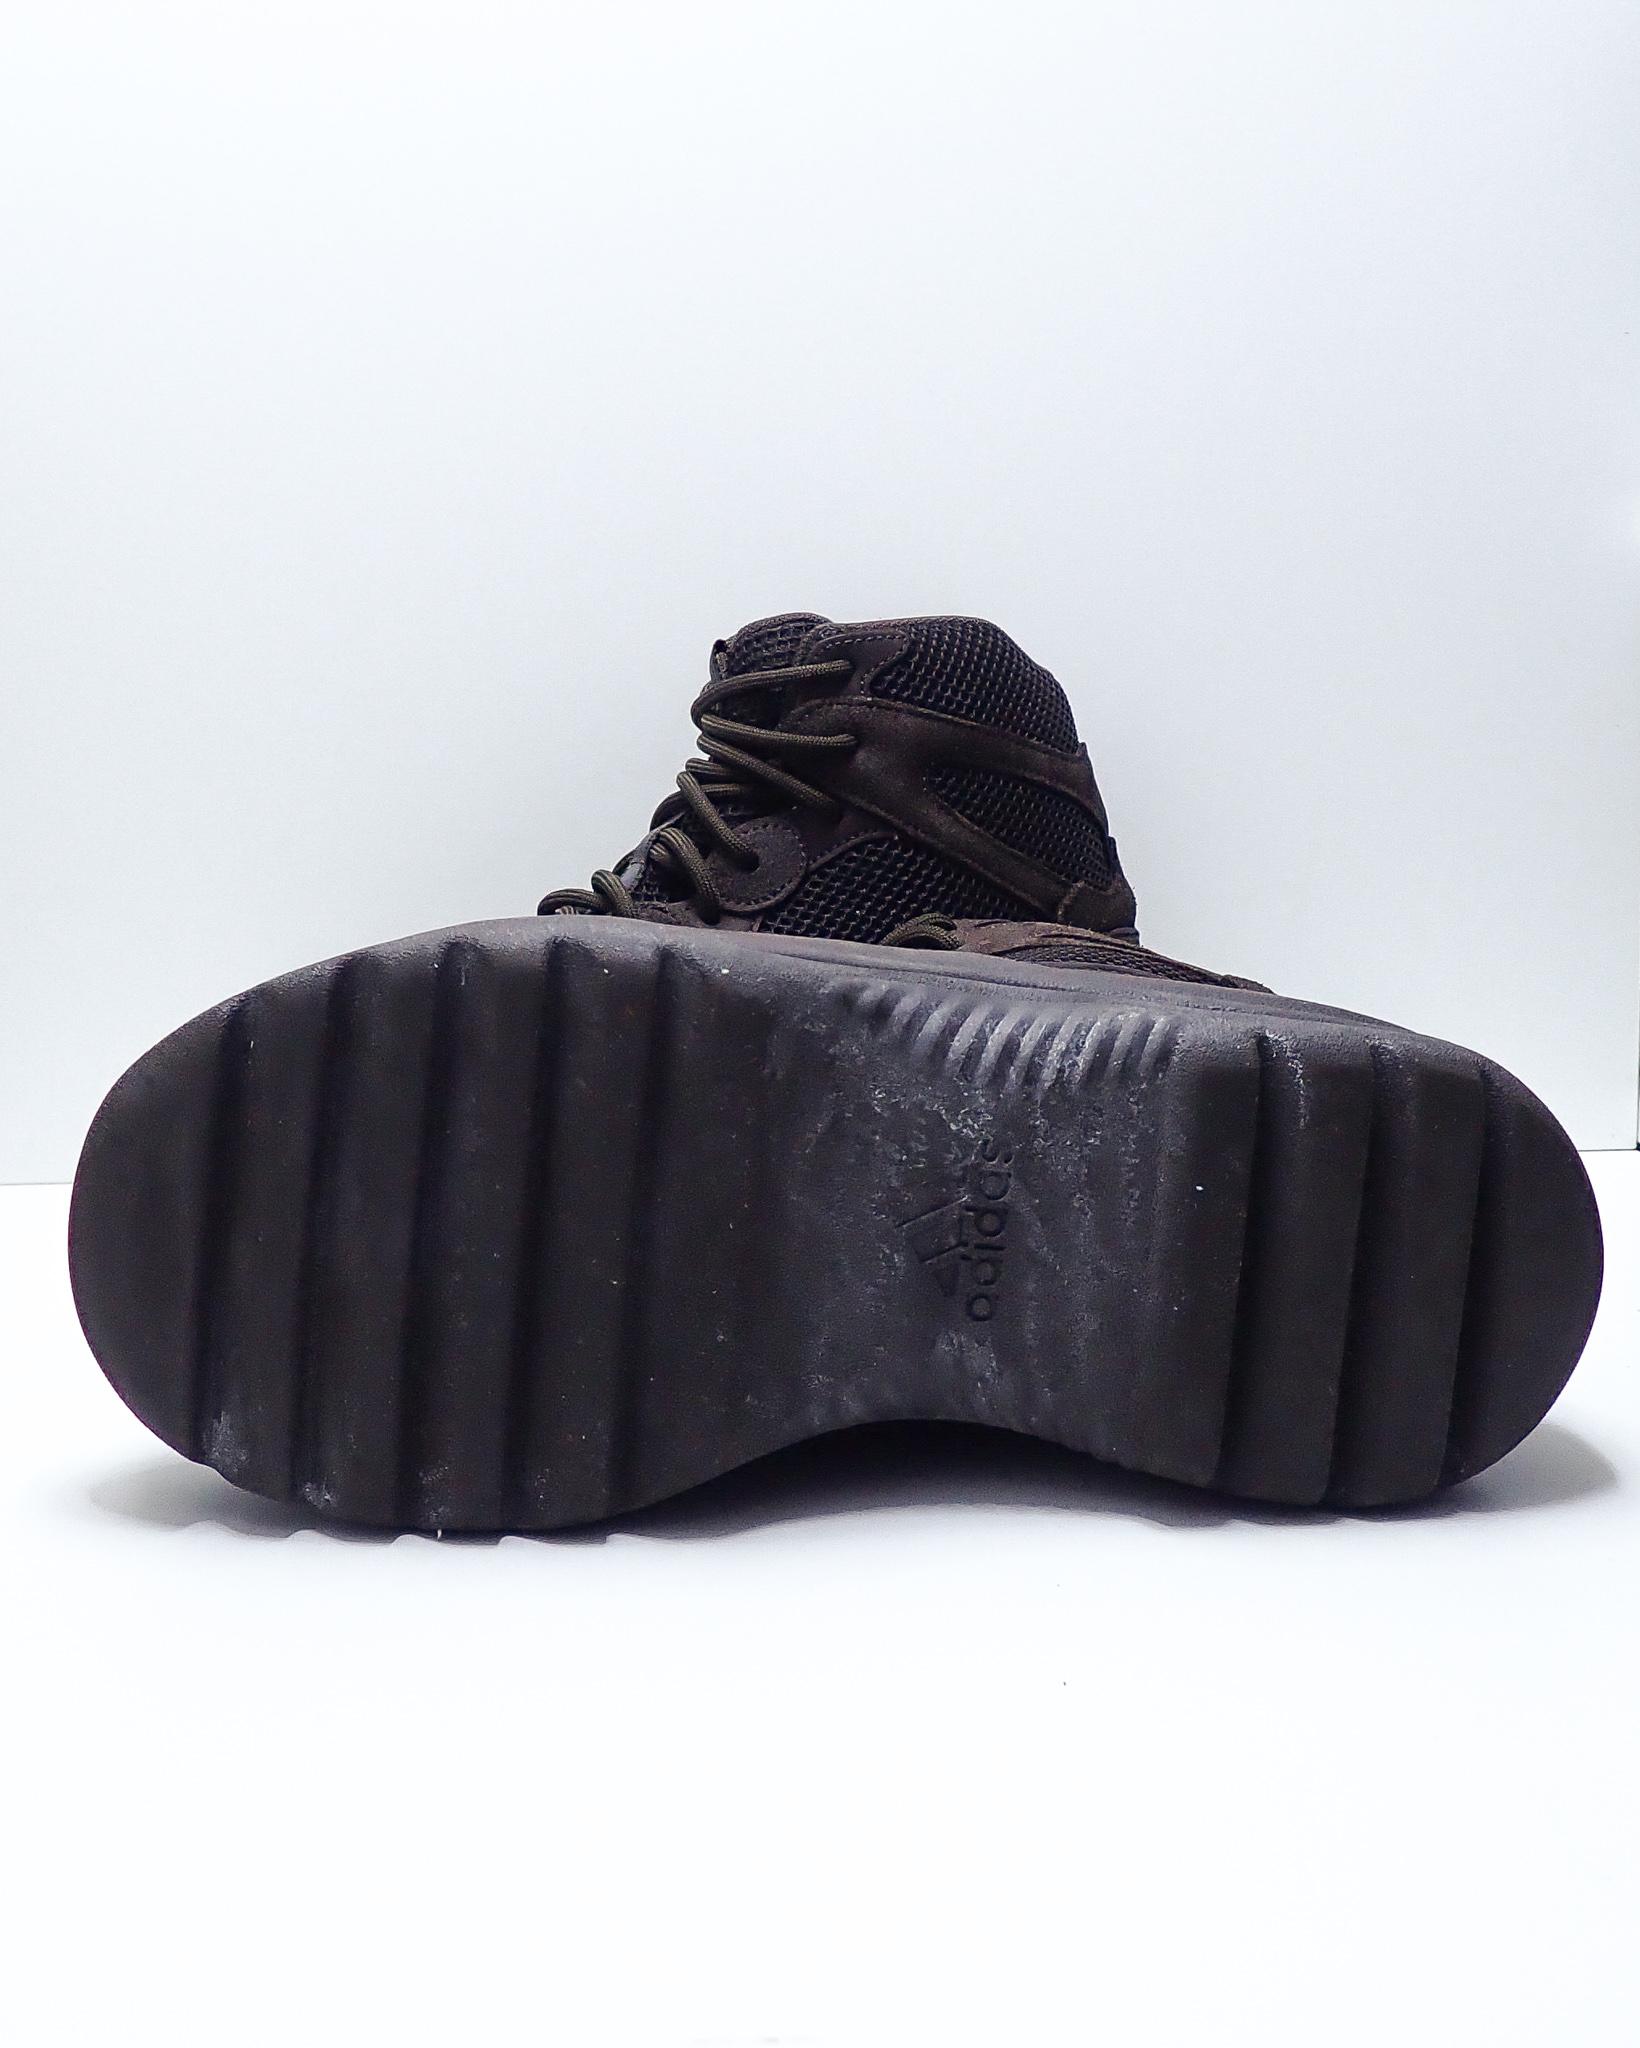 Adidas Yeezy Desert Boot Oil (2019)